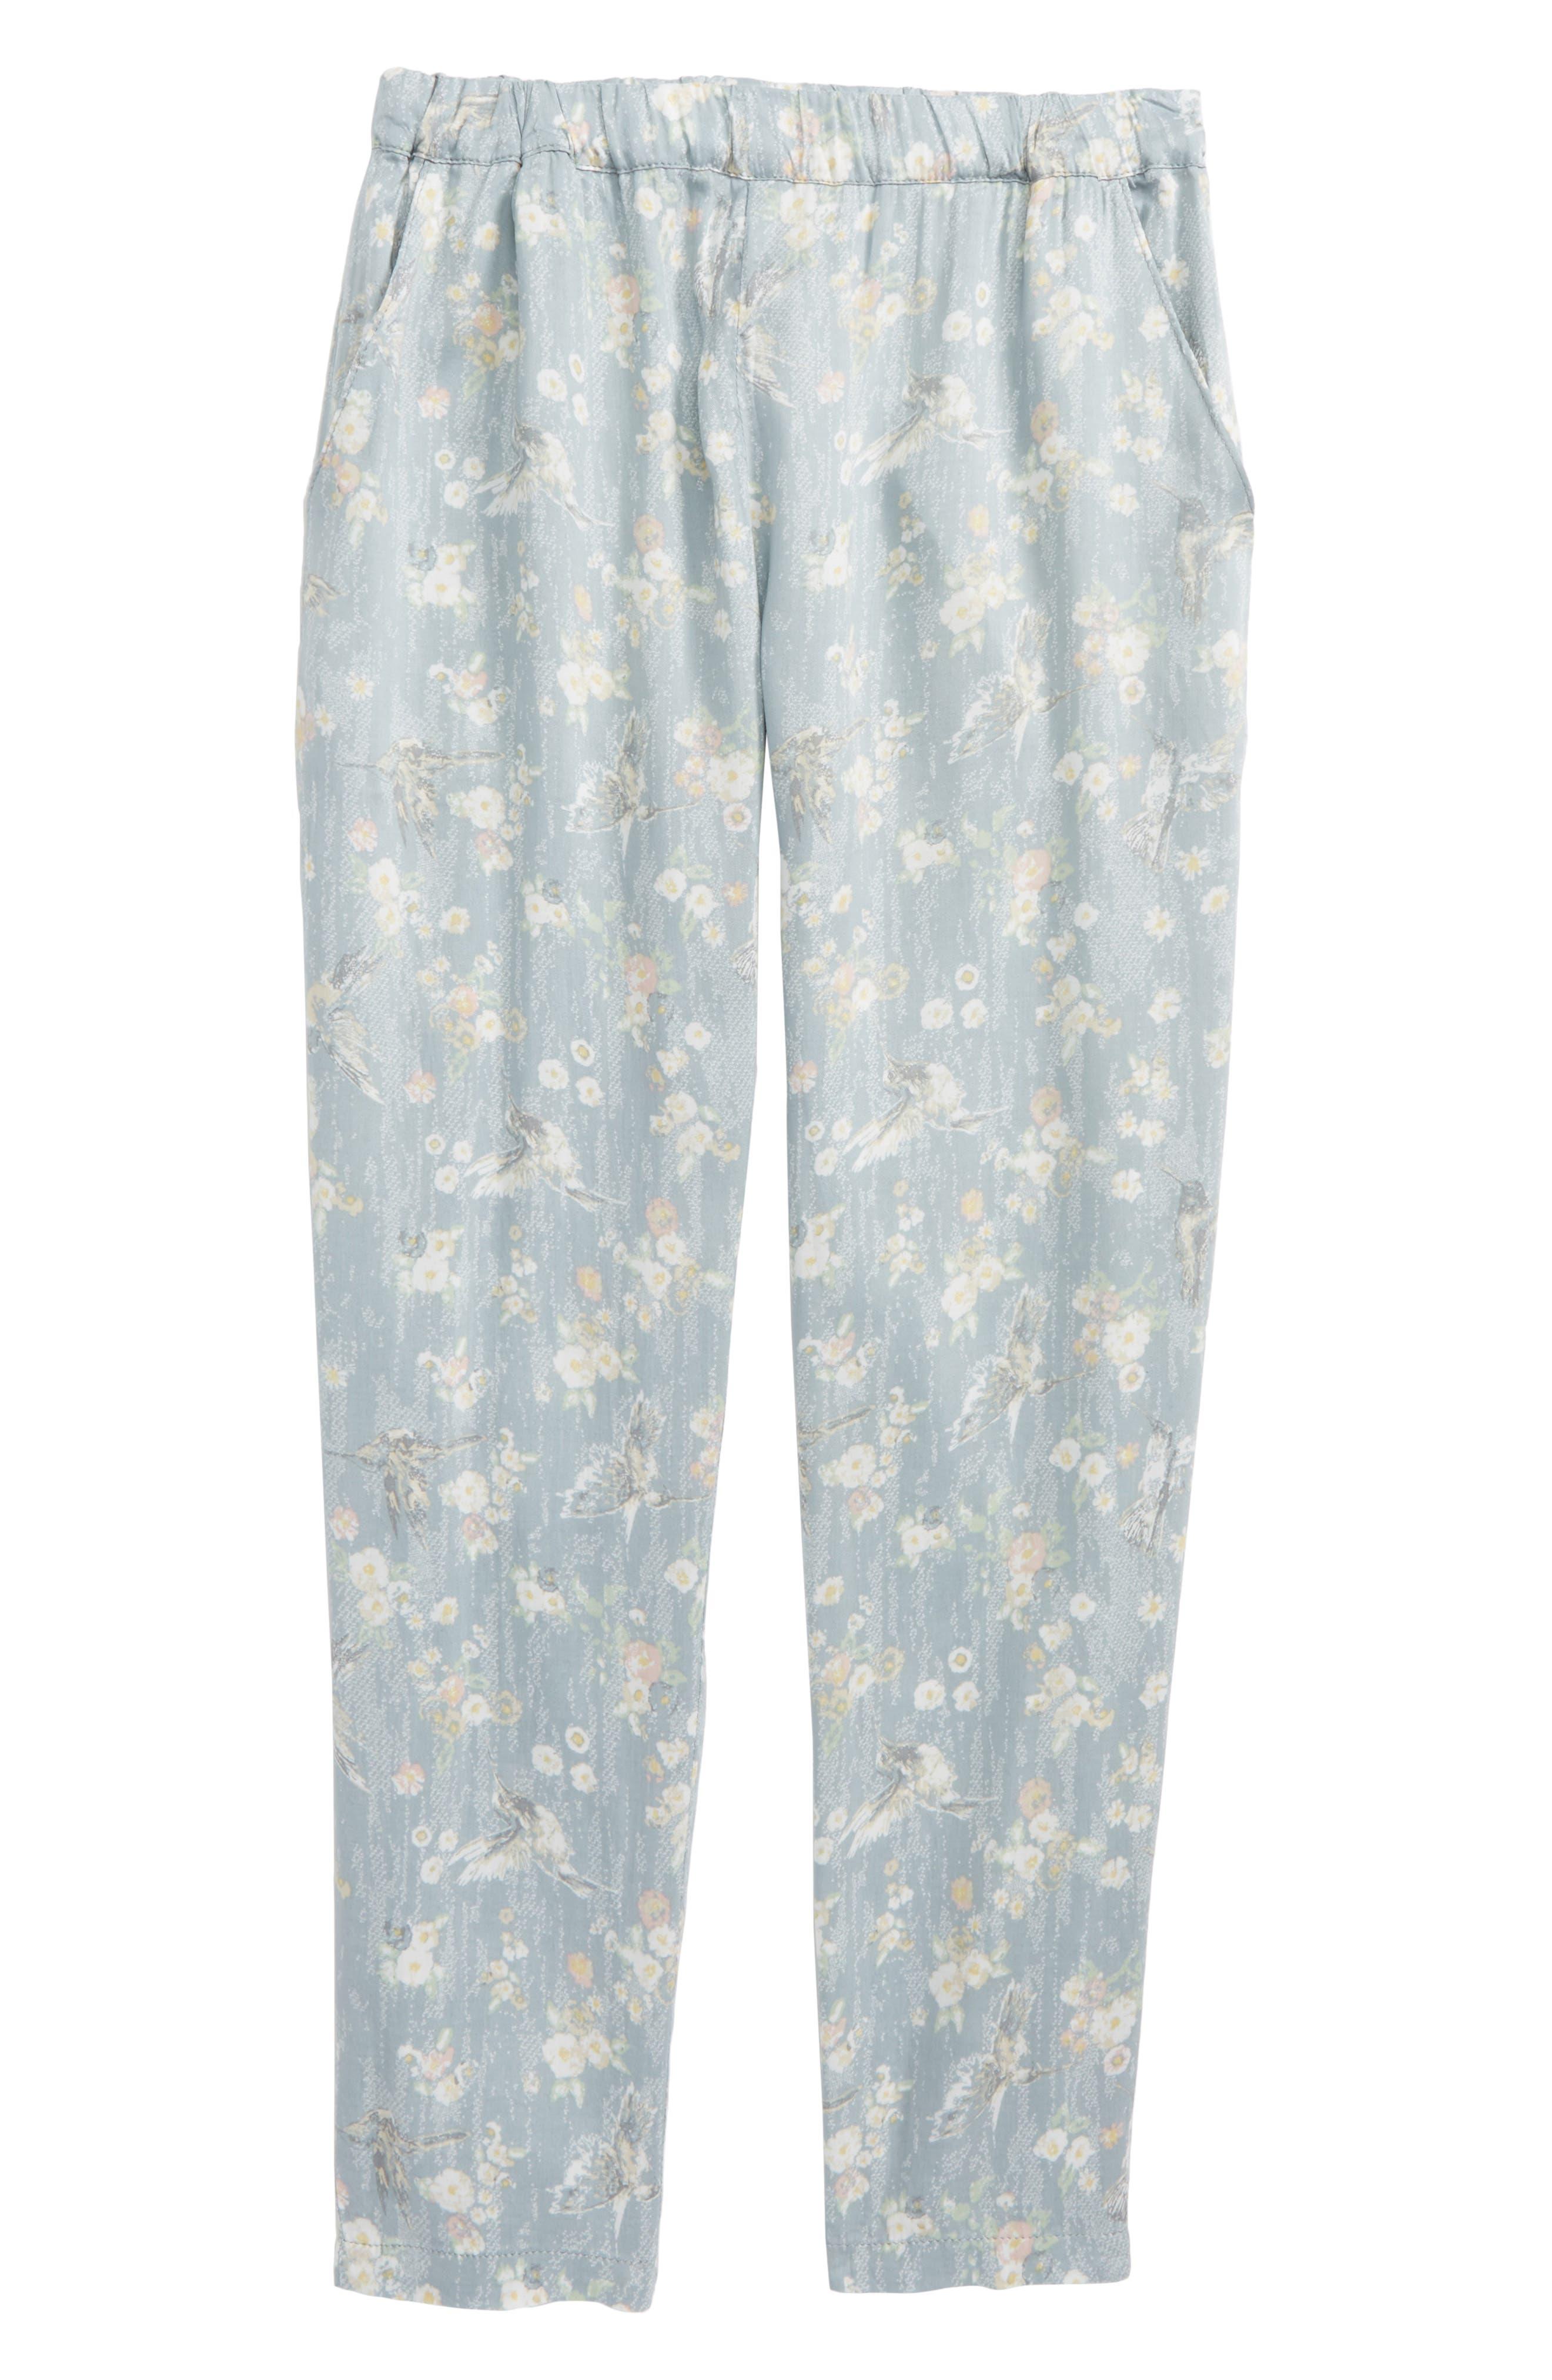 Sonia Floral Print Pants,                         Main,                         color,